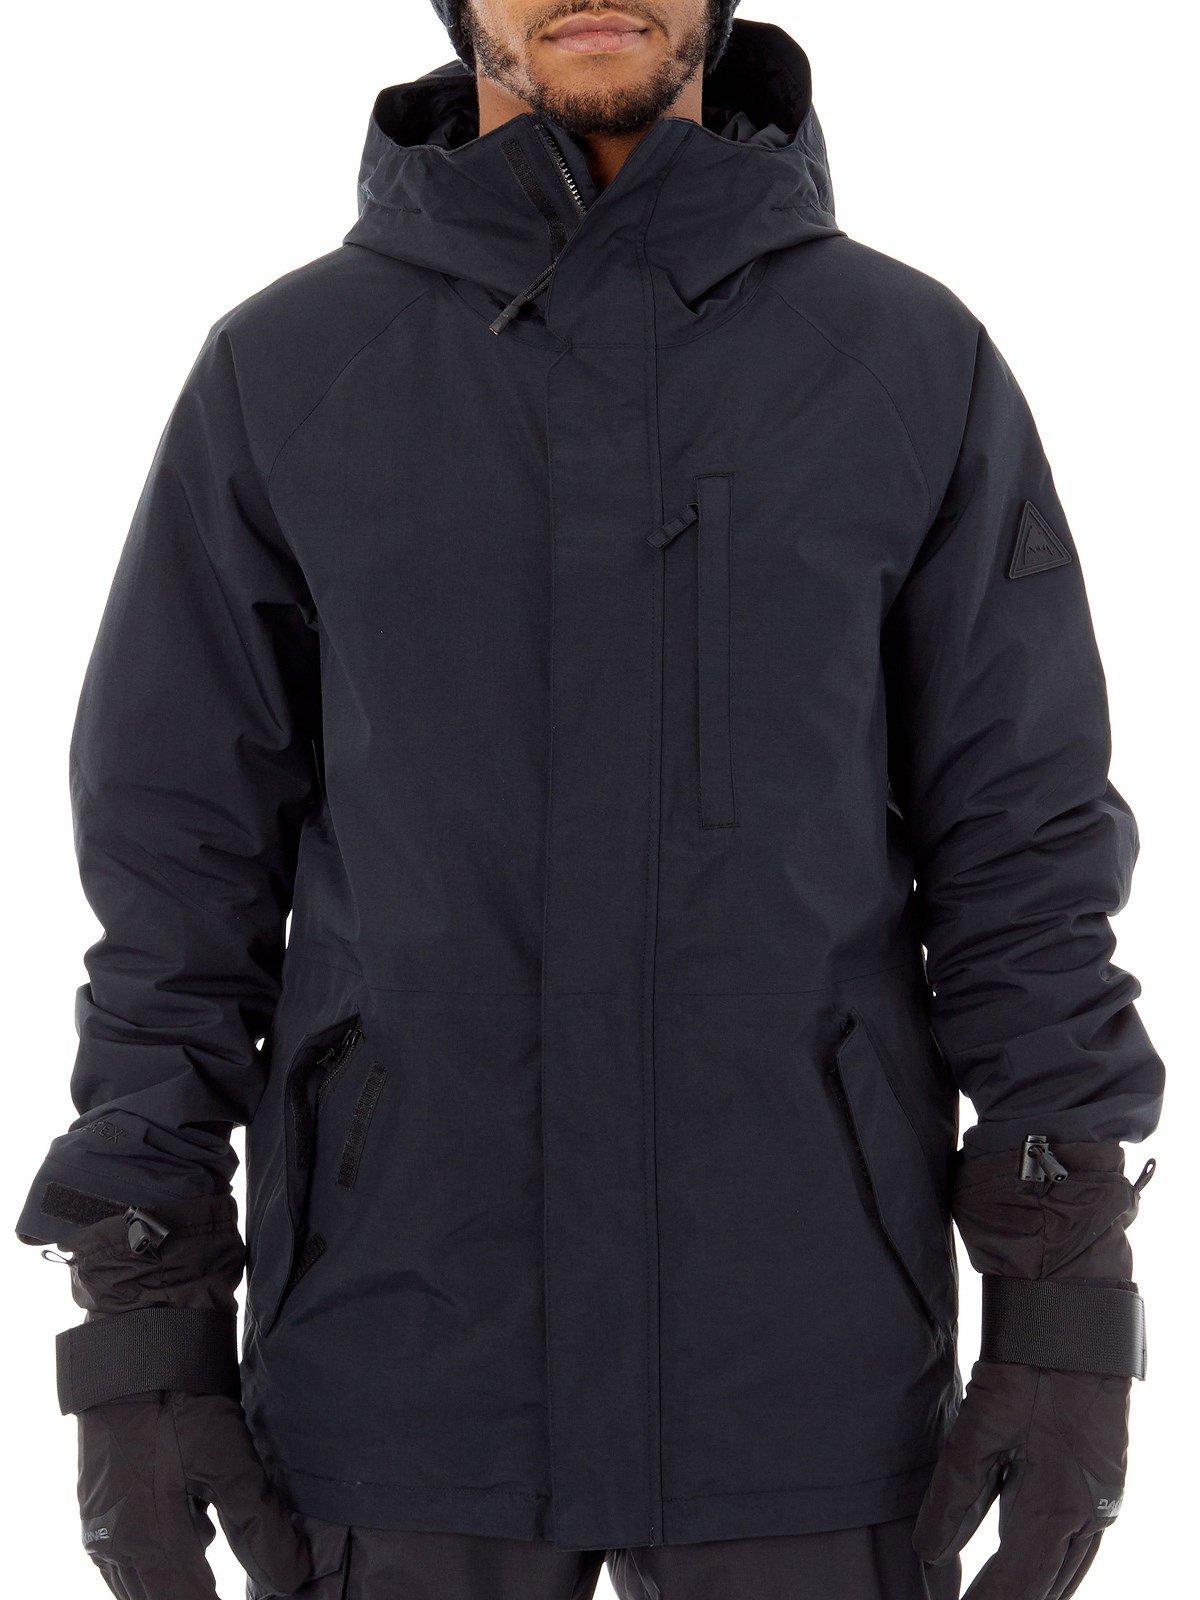 Burton Gore-Tex Radial Insulated Men's Snowboard Jacket - True Black